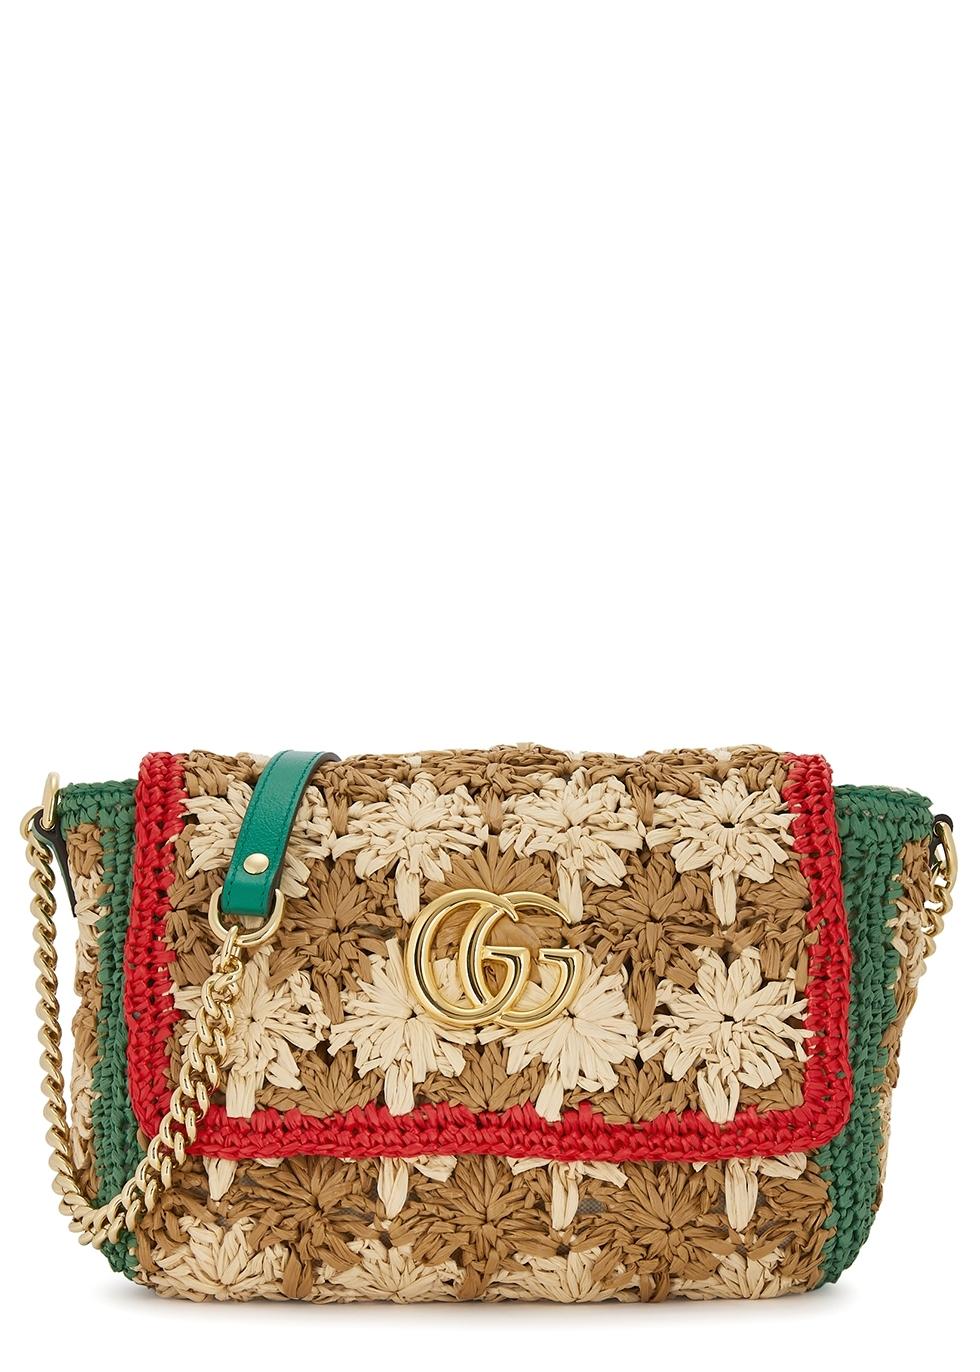 b98bd62f71f745 Women's Designer Bags, Handbags and Purses - Harvey Nichols